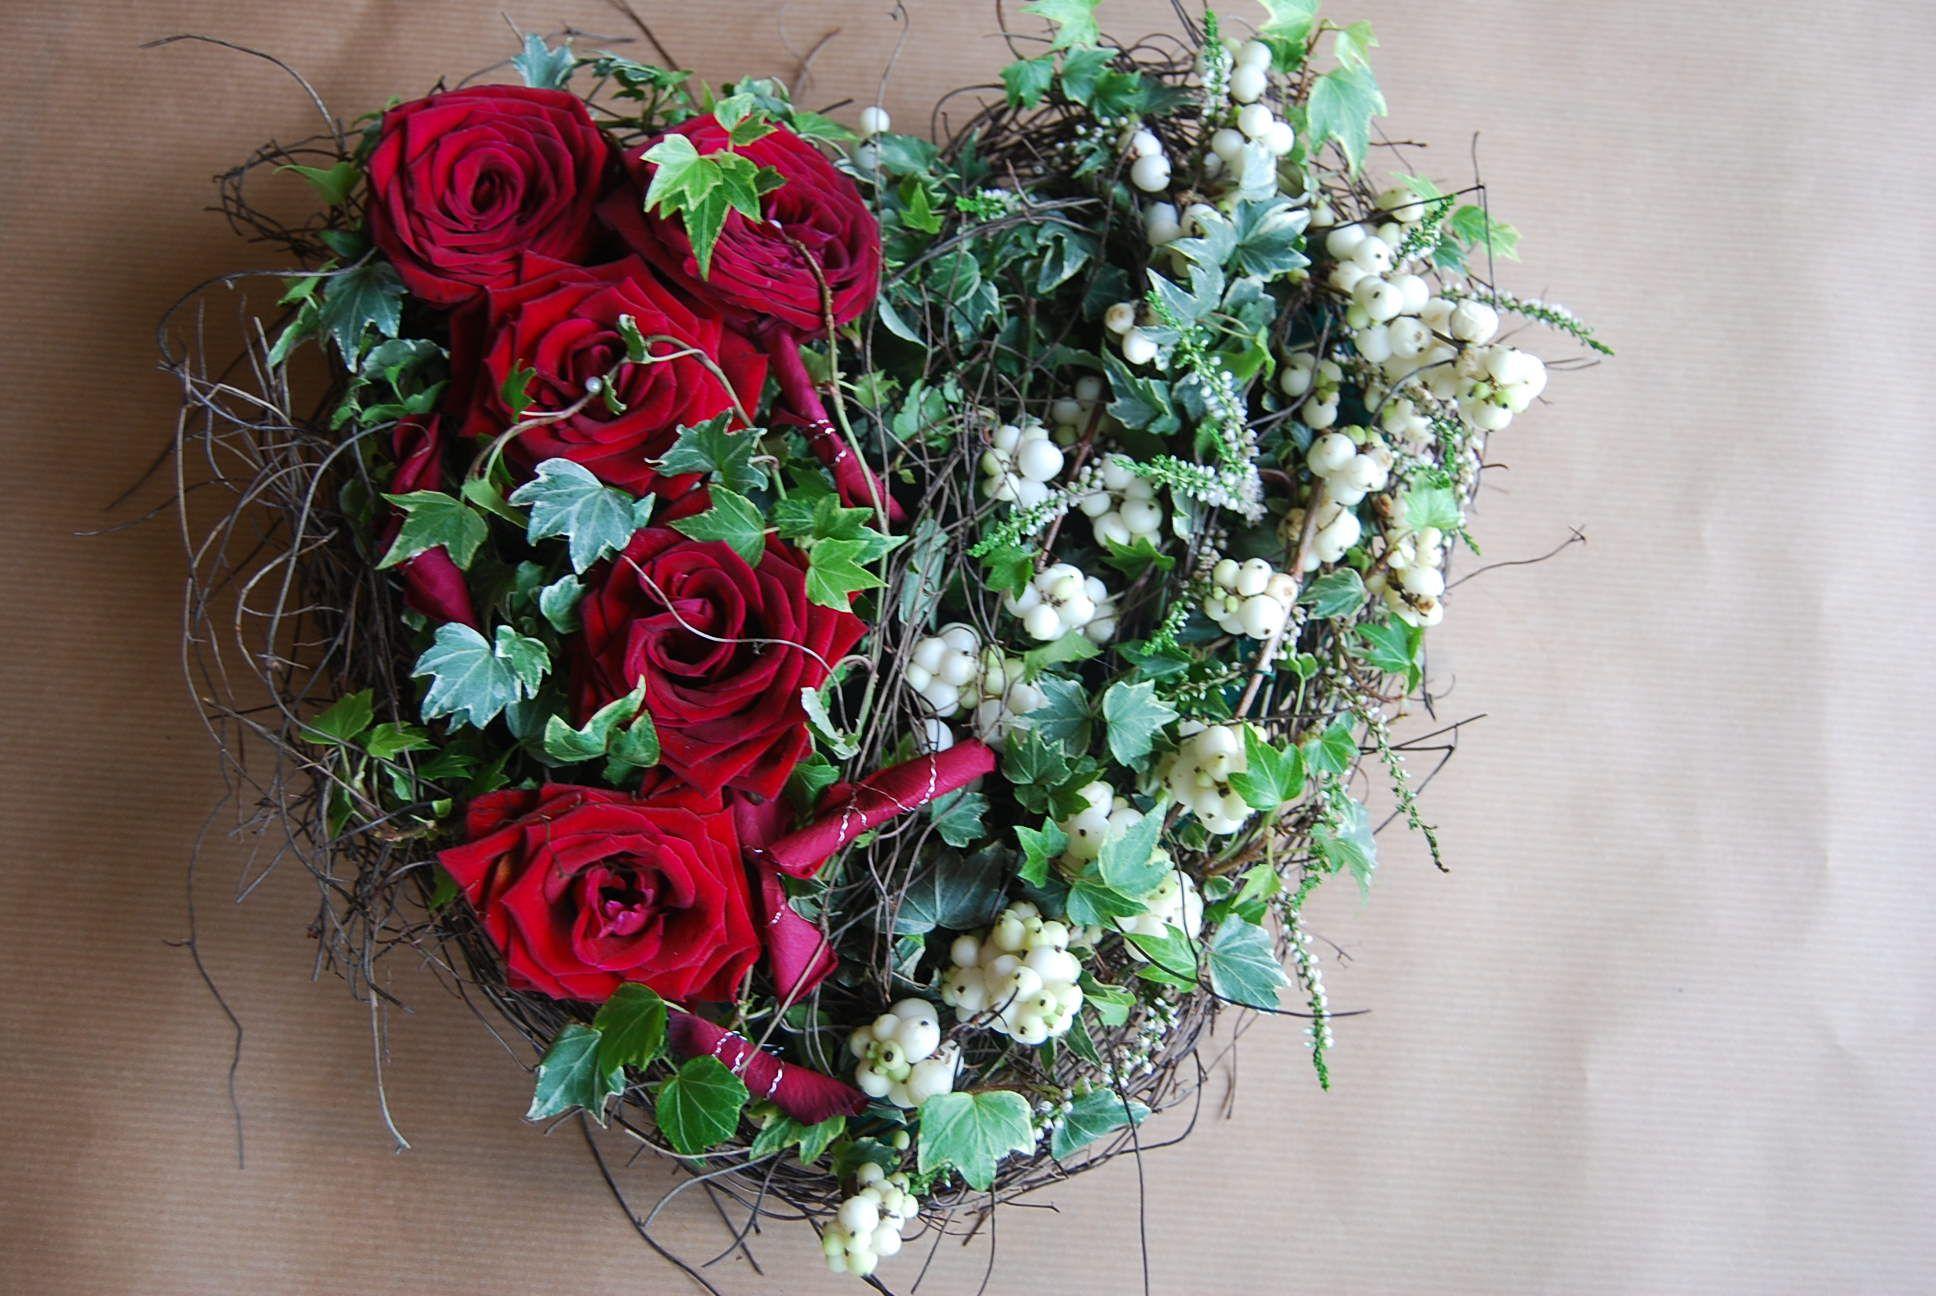 Burgundy funeral sheath funeral arrangement pinterest funeral funeral arrangement pinterest funeral funeral flowers and funeral arrangements izmirmasajfo